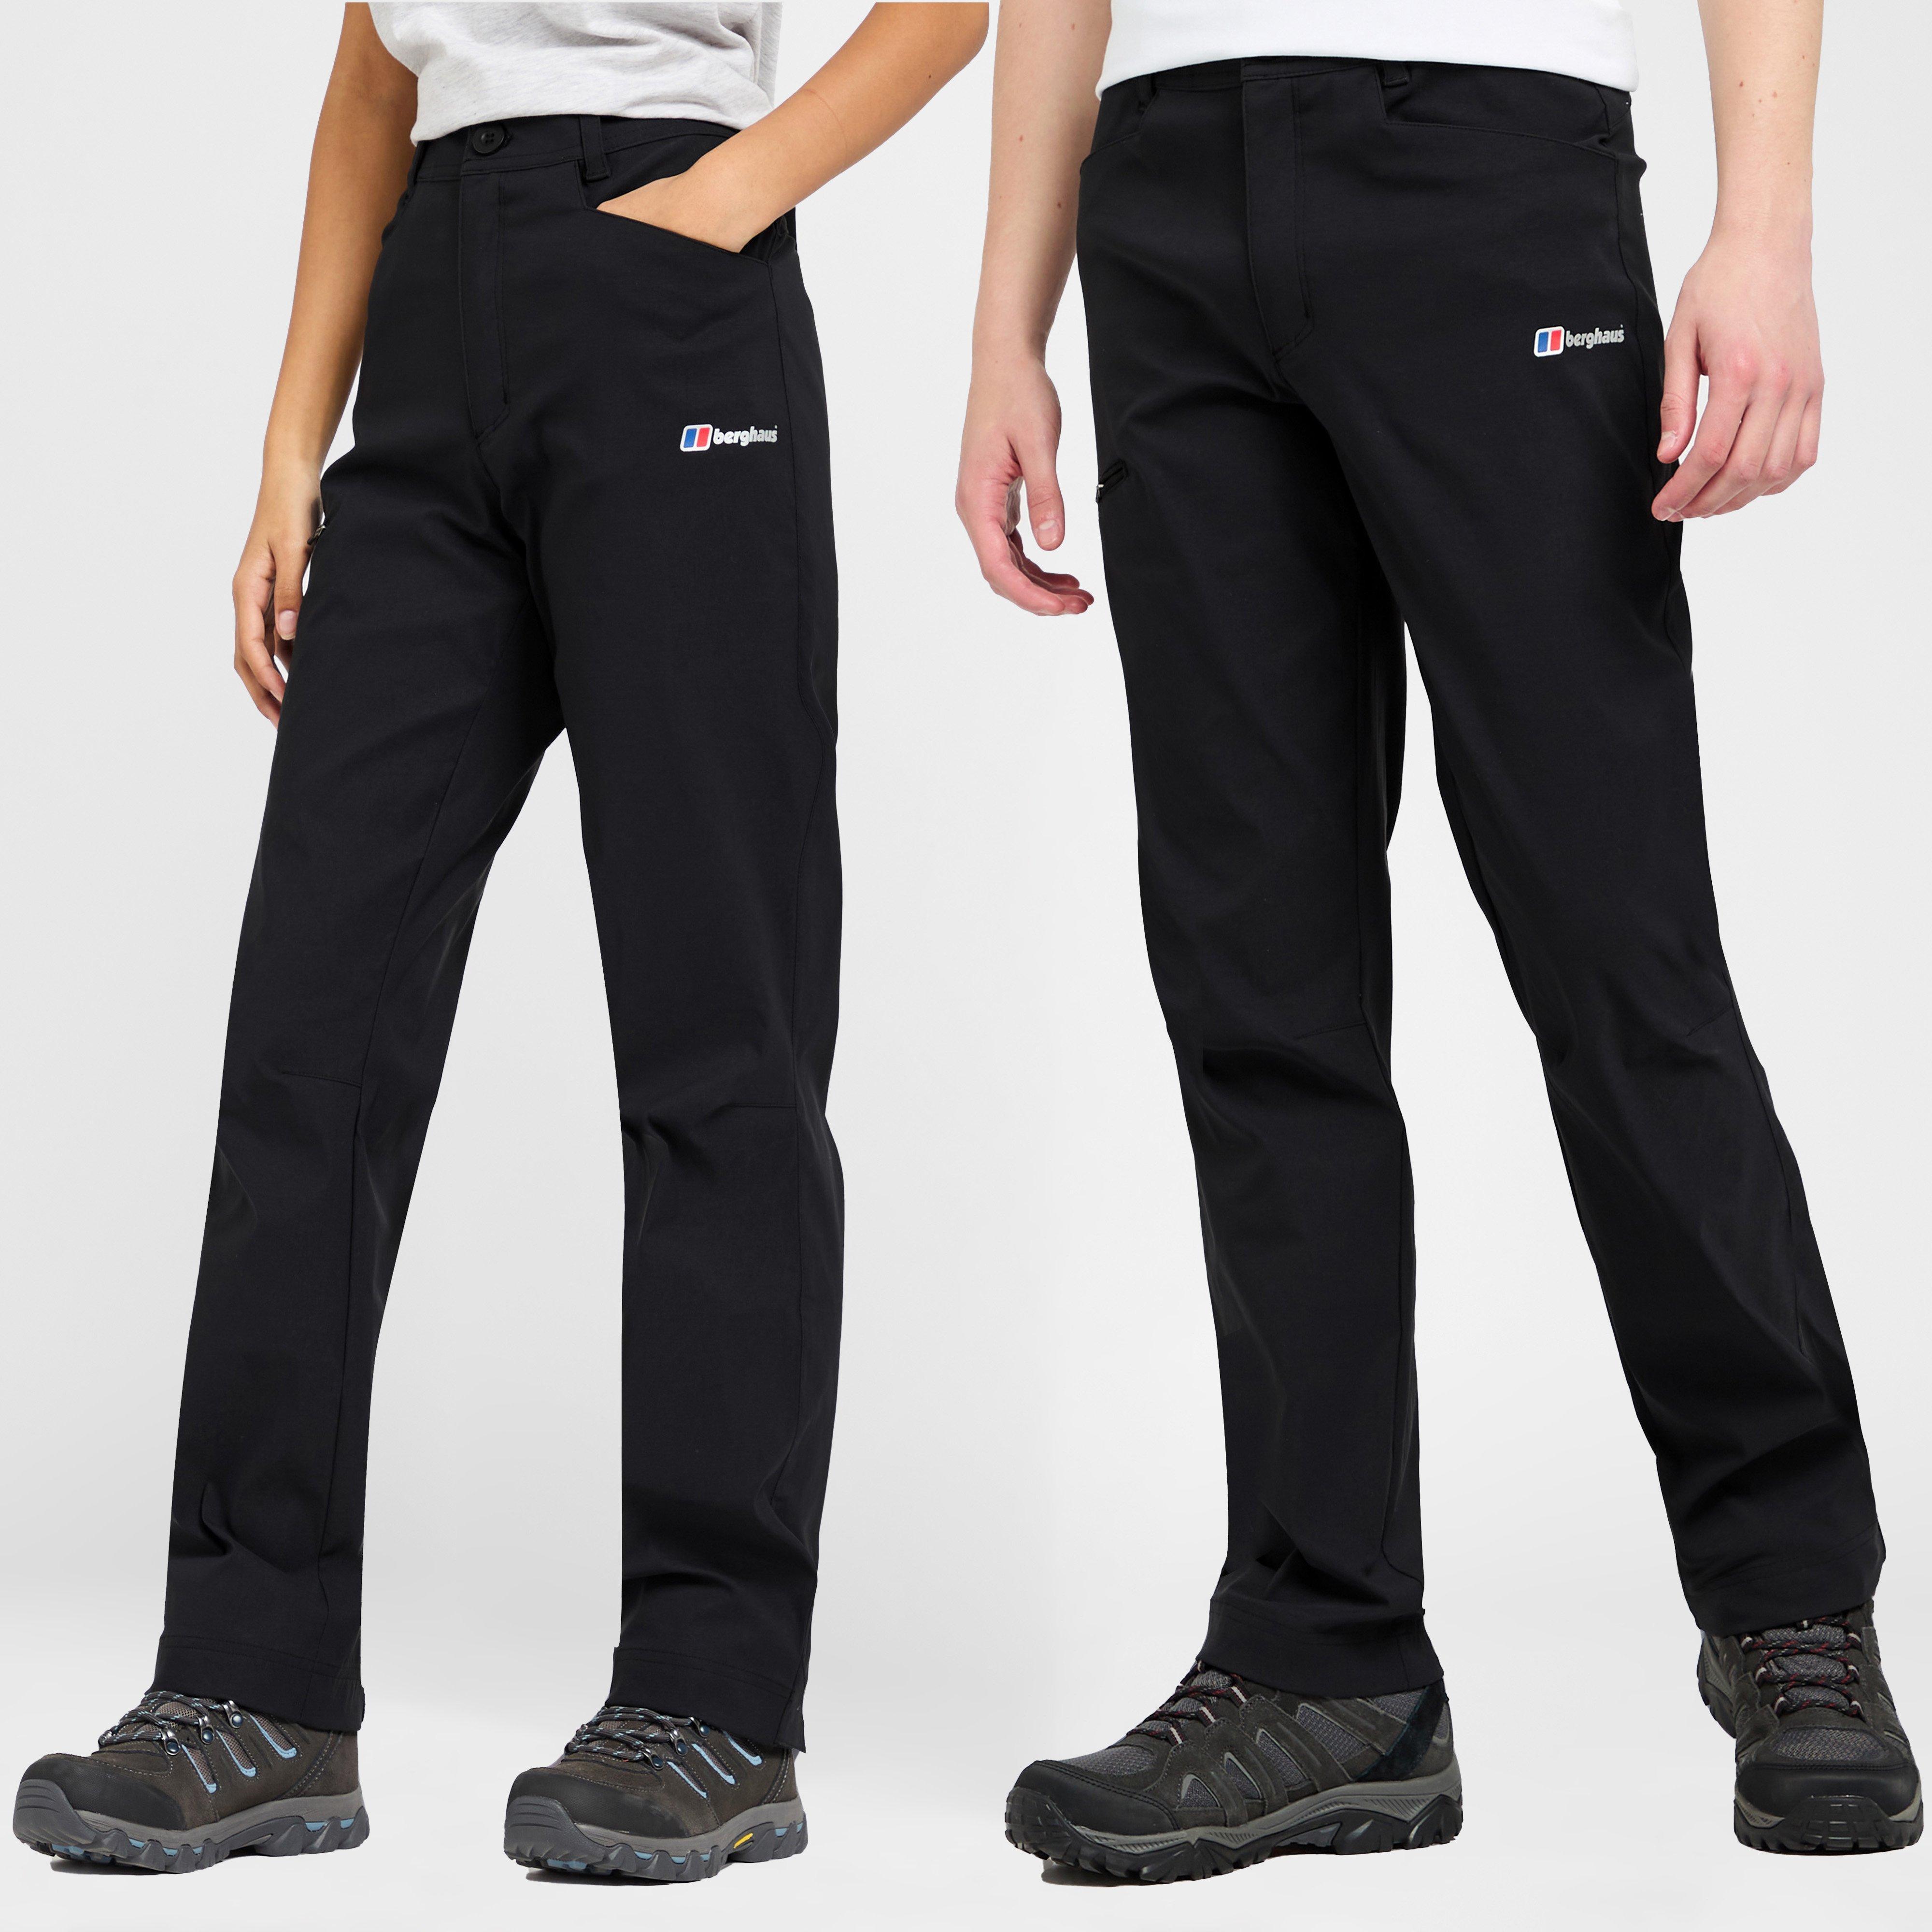 Berghaus Kids Walking Trousers - Black/blk  Black/blk